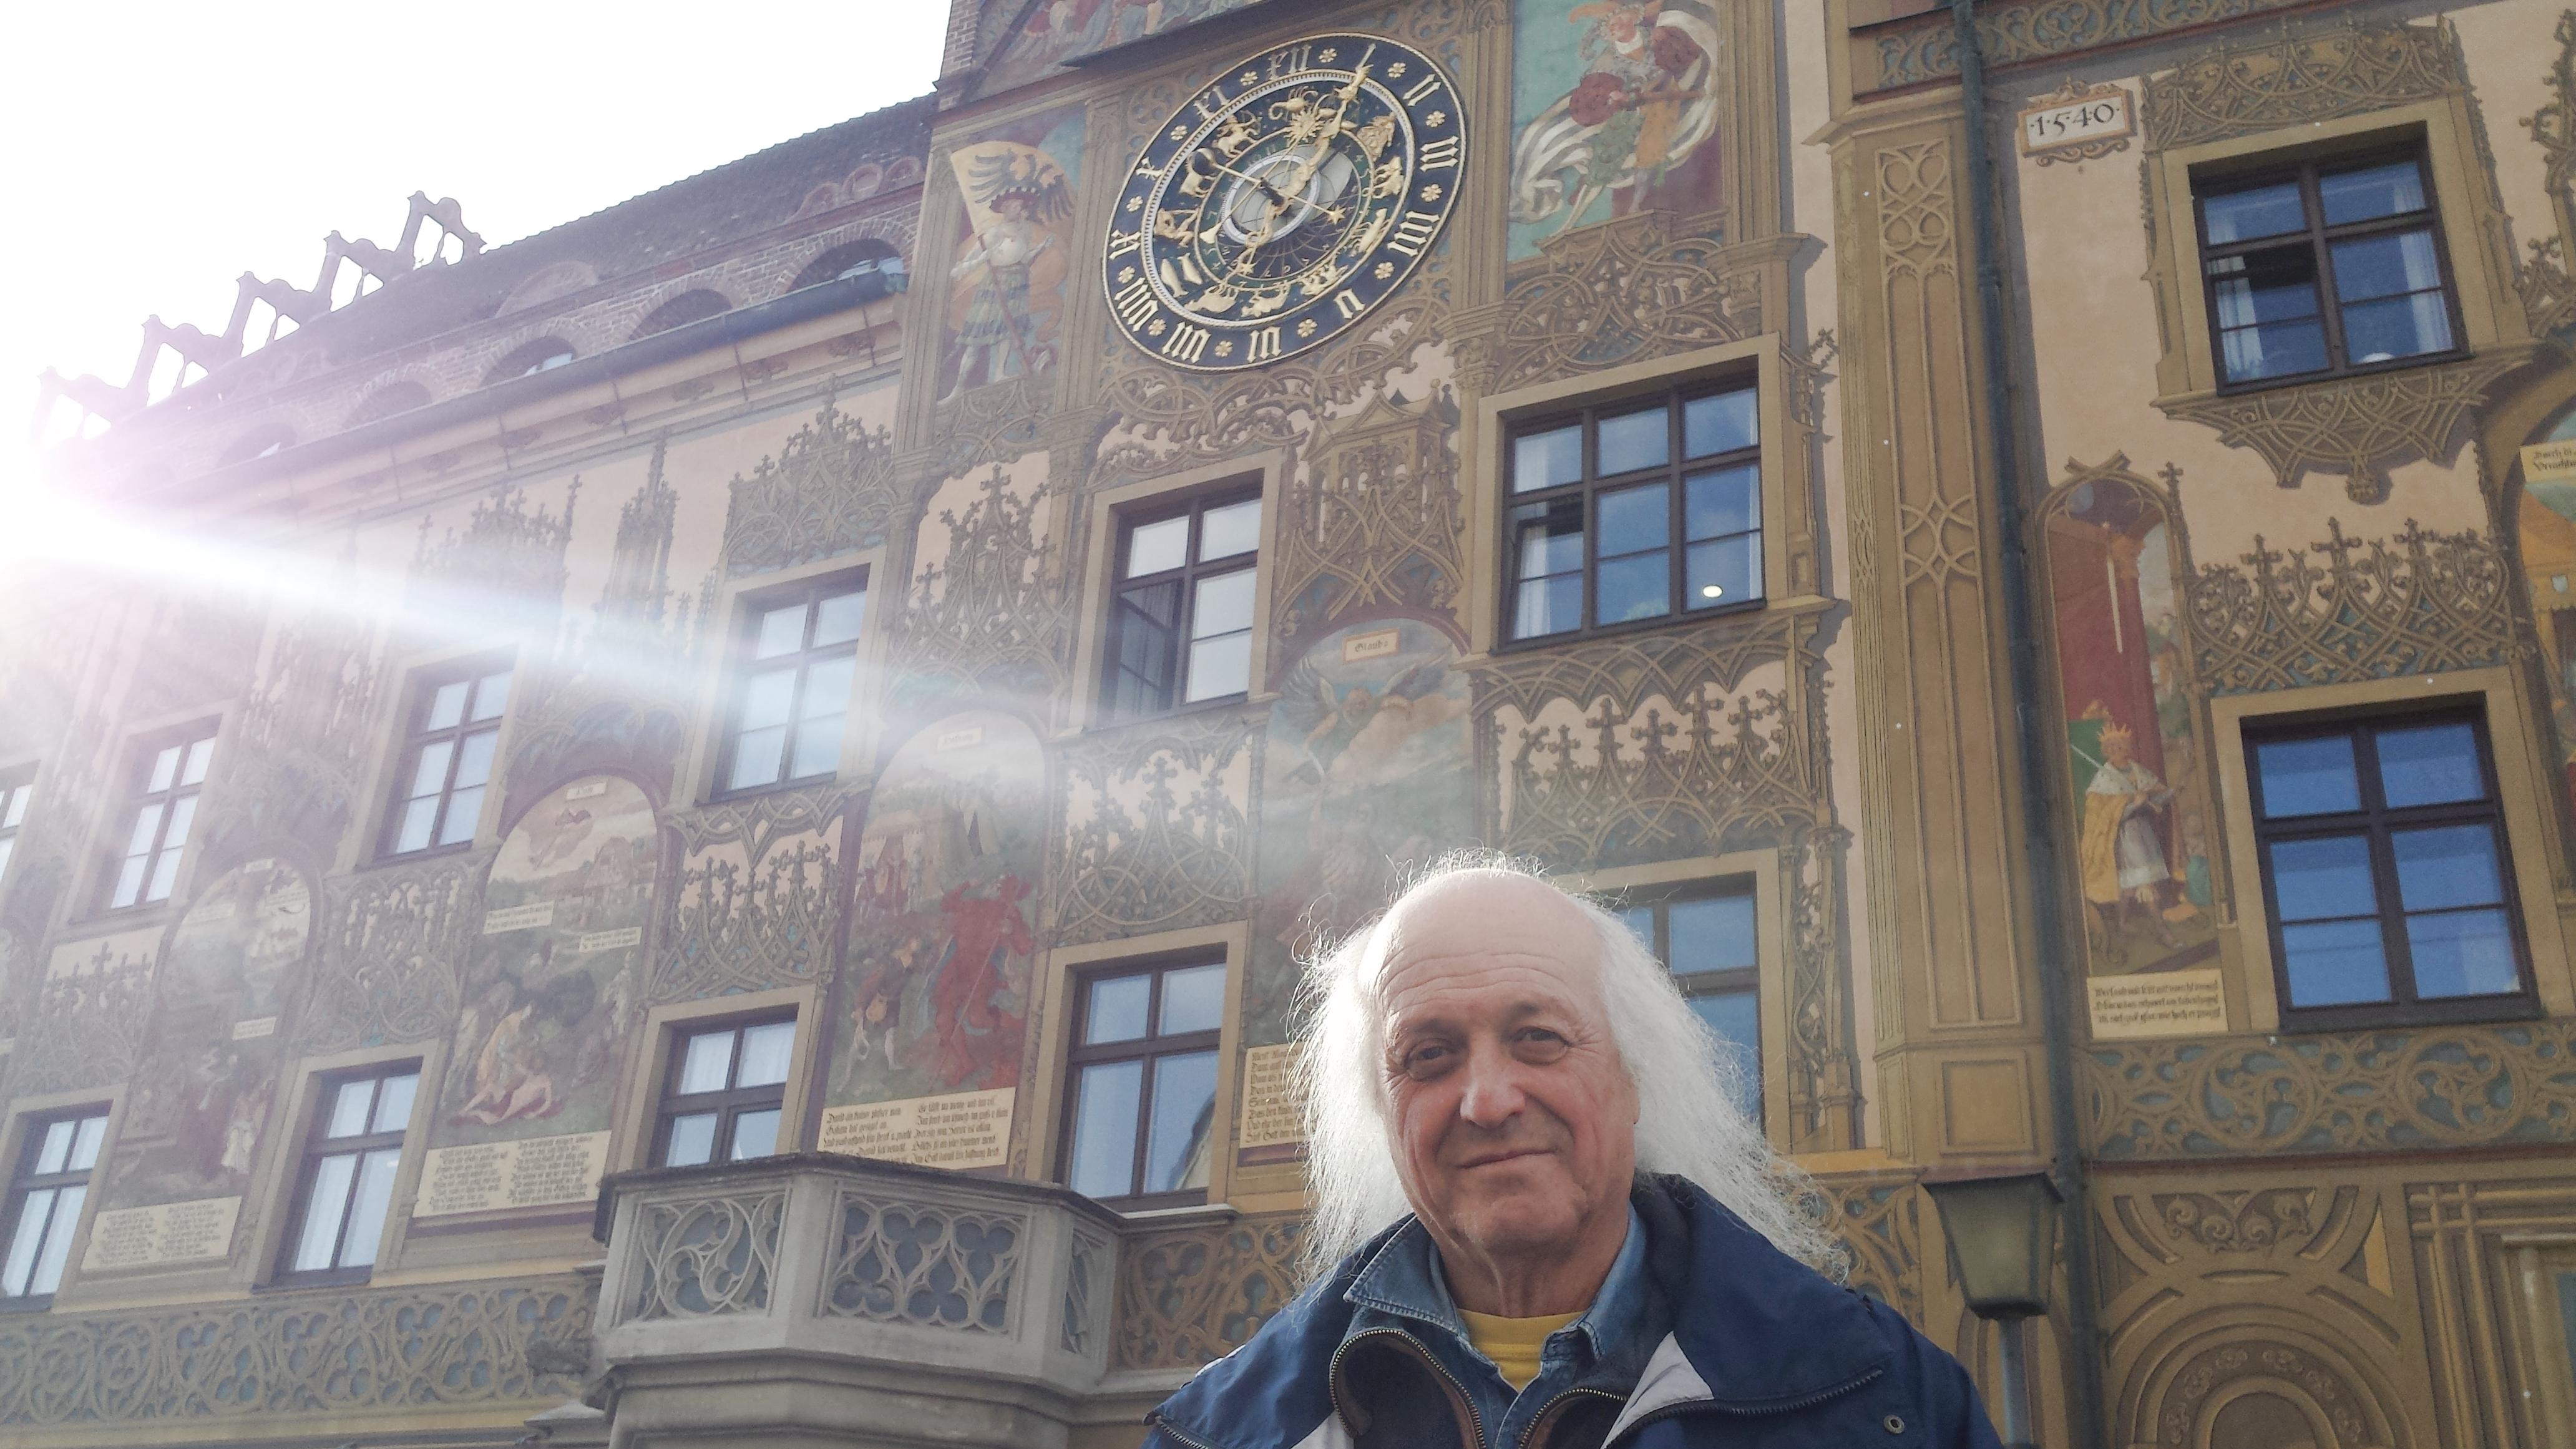 Manfred-Eichhorn-am-Ulmer-Rathaus